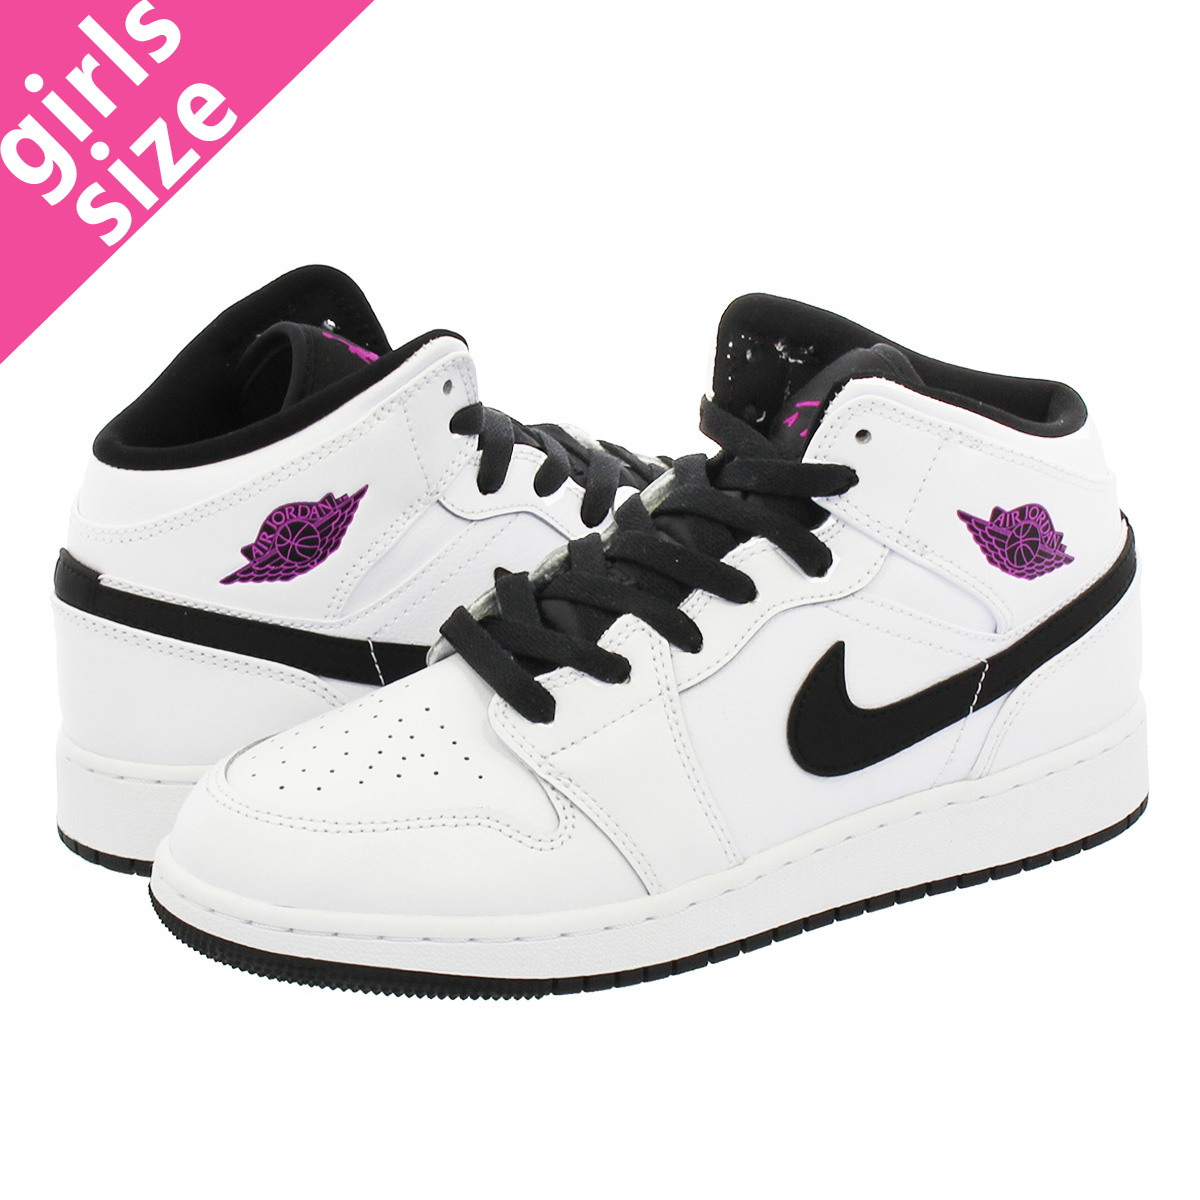 f522154eb0755e NIKE AIR JORDAN 1 MID GG Nike Air Jordan 1 mid GG WHITE BLACK FUSCHIA BLAST  555